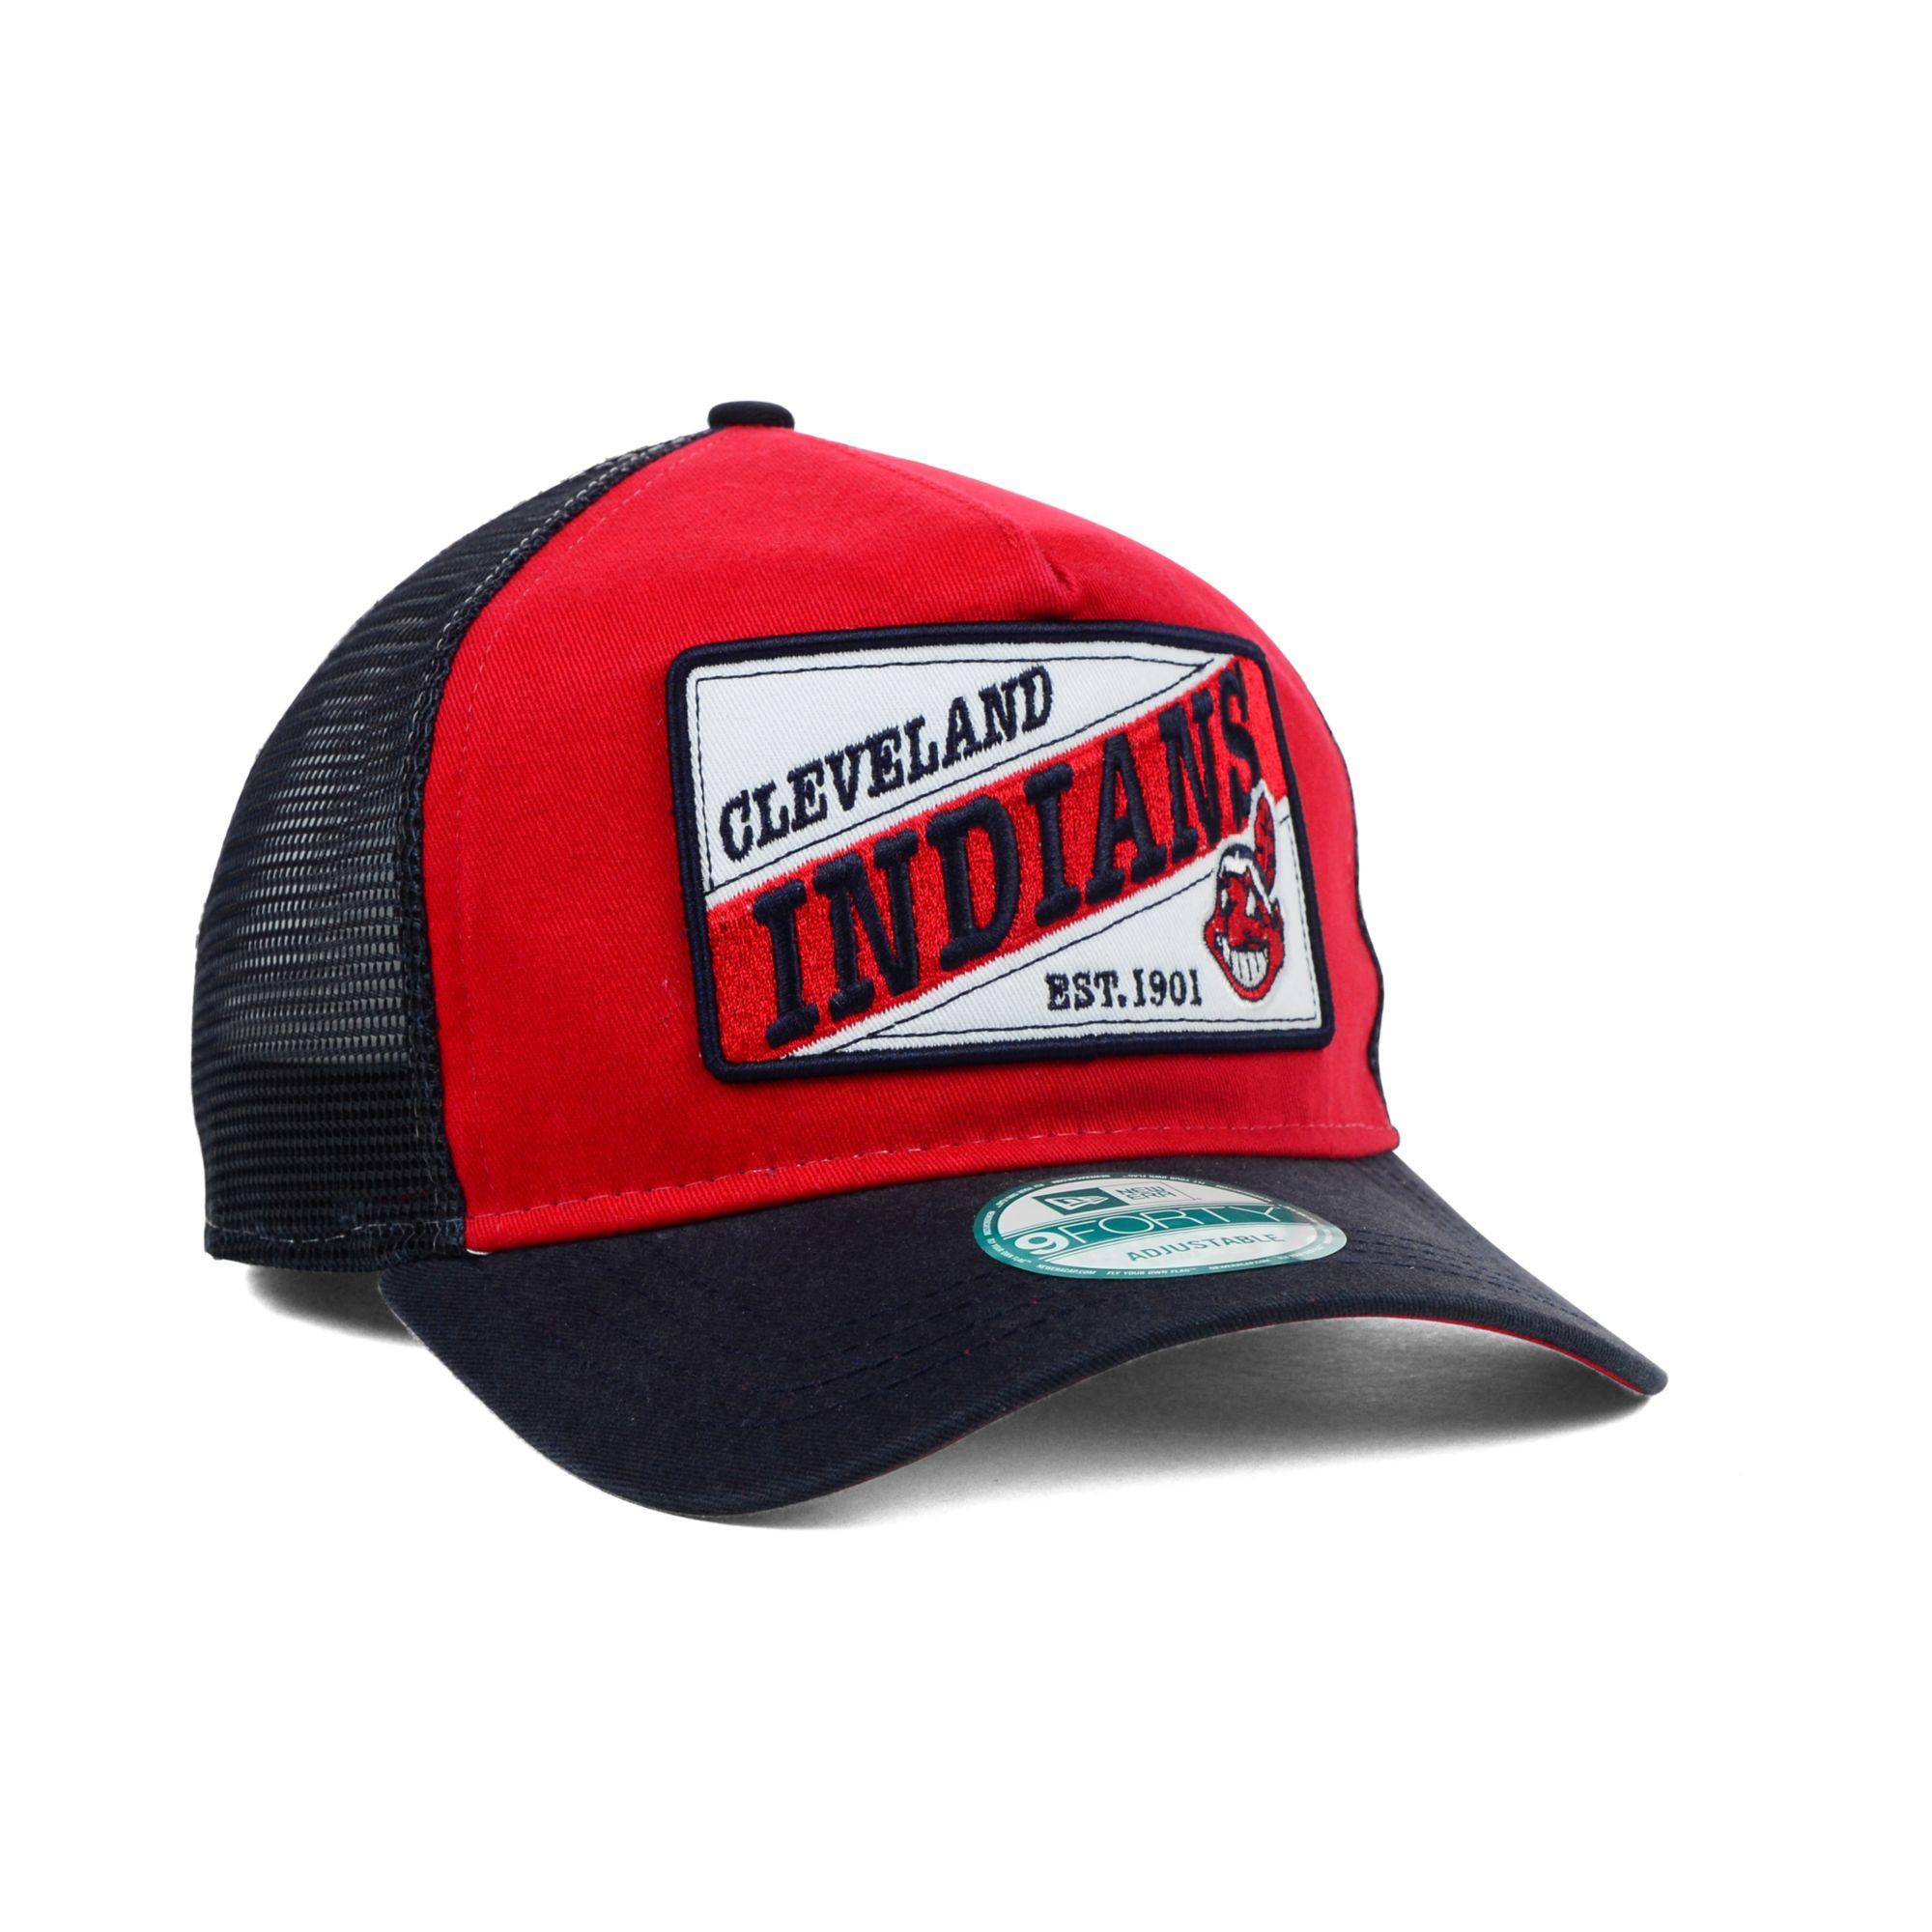 37423d2bf05 ... ebay lyst ktz cleveland indians mlb 18 wheeler 9forty cap in red for  men 7f2ab 18b41